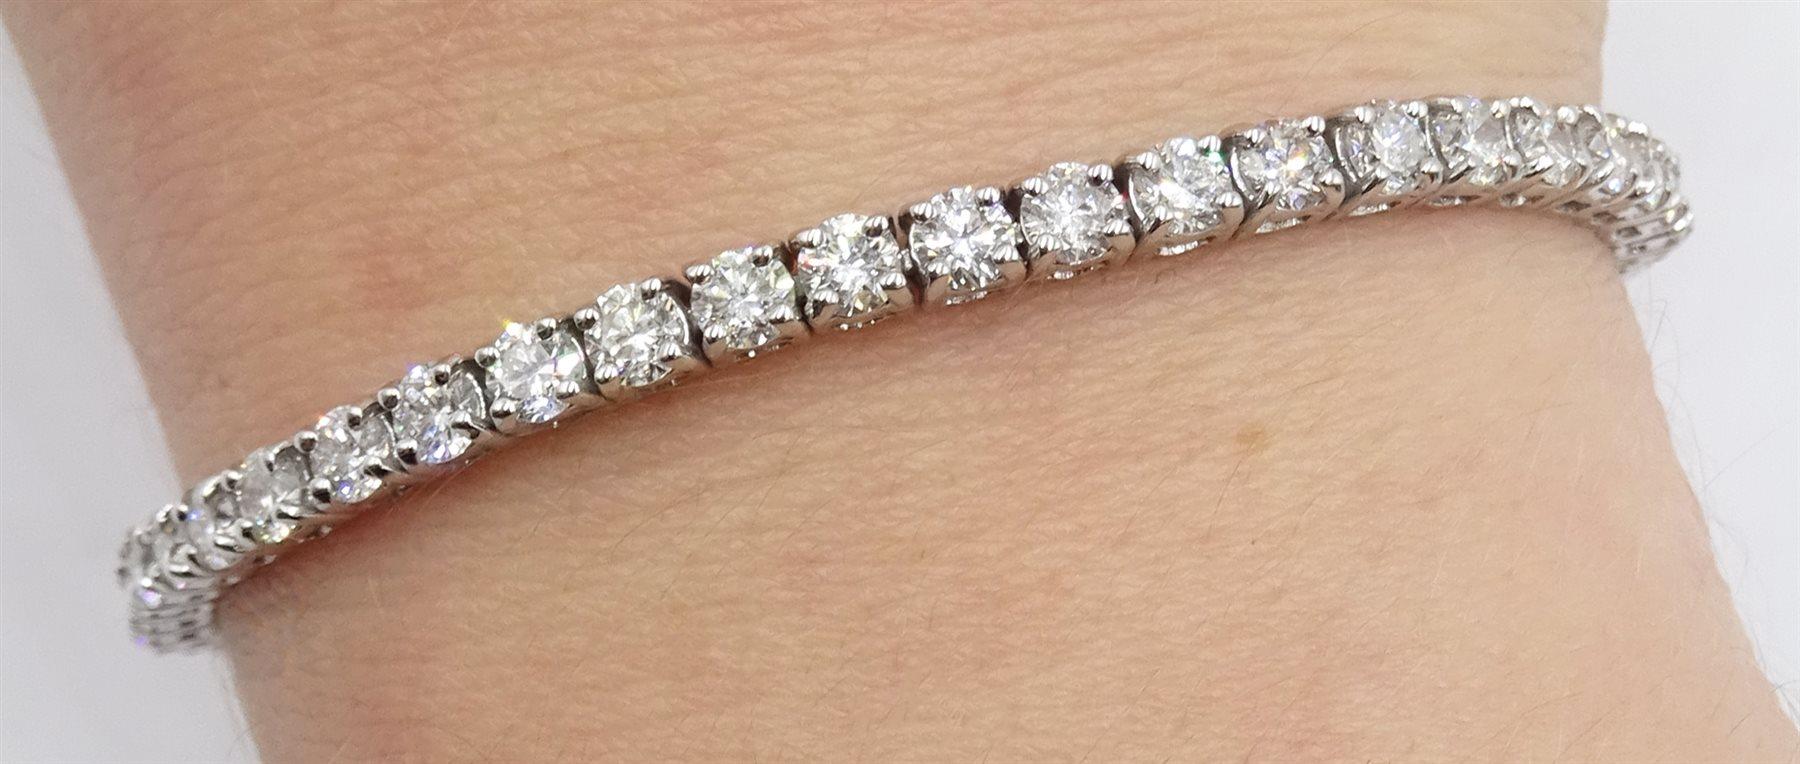 18ct white gold diamond line bracelet - Image 2 of 5